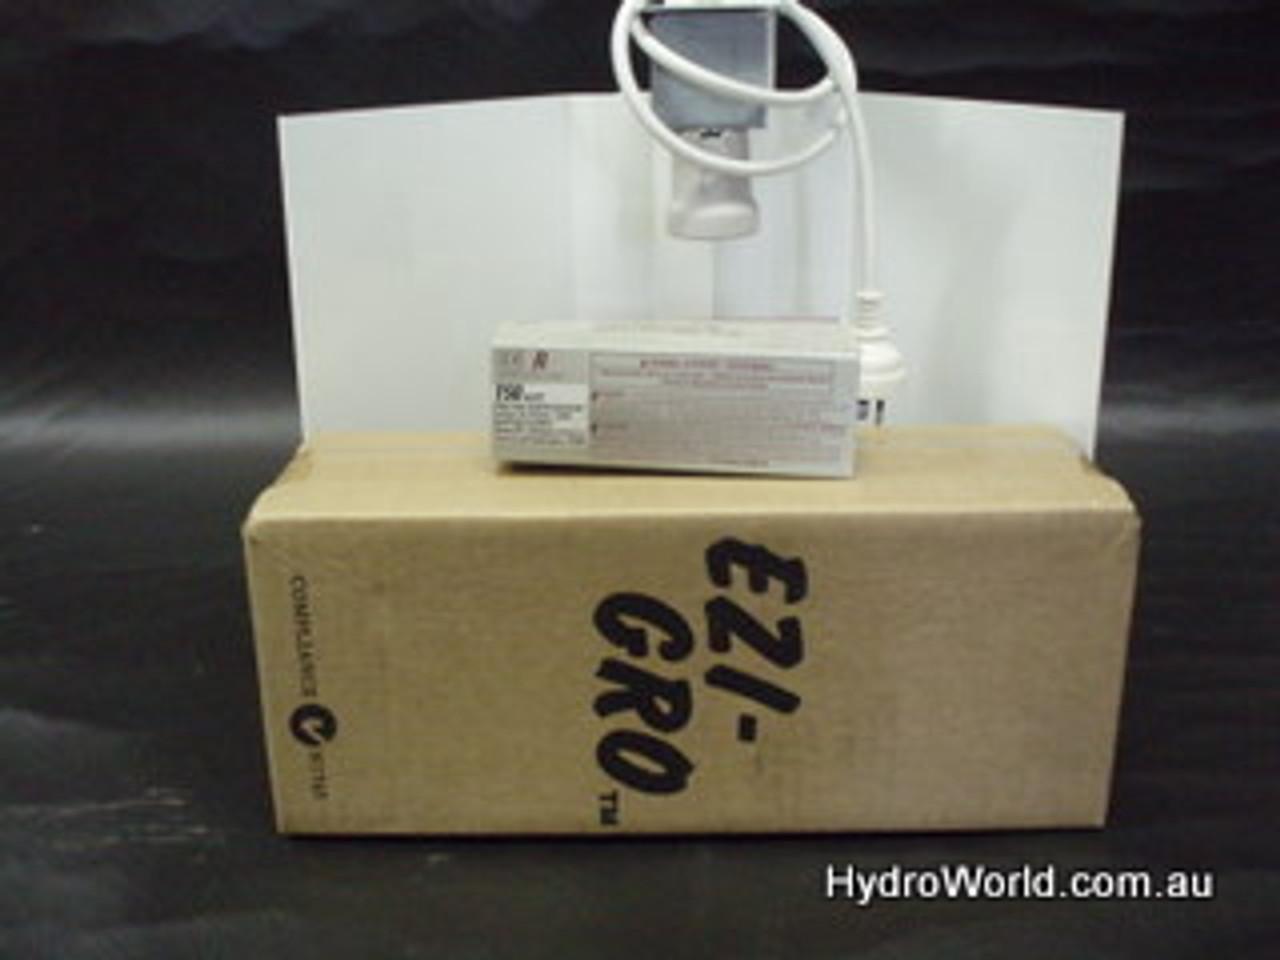 150w mh Gullwing Shade with Ezi-Grow Ballast